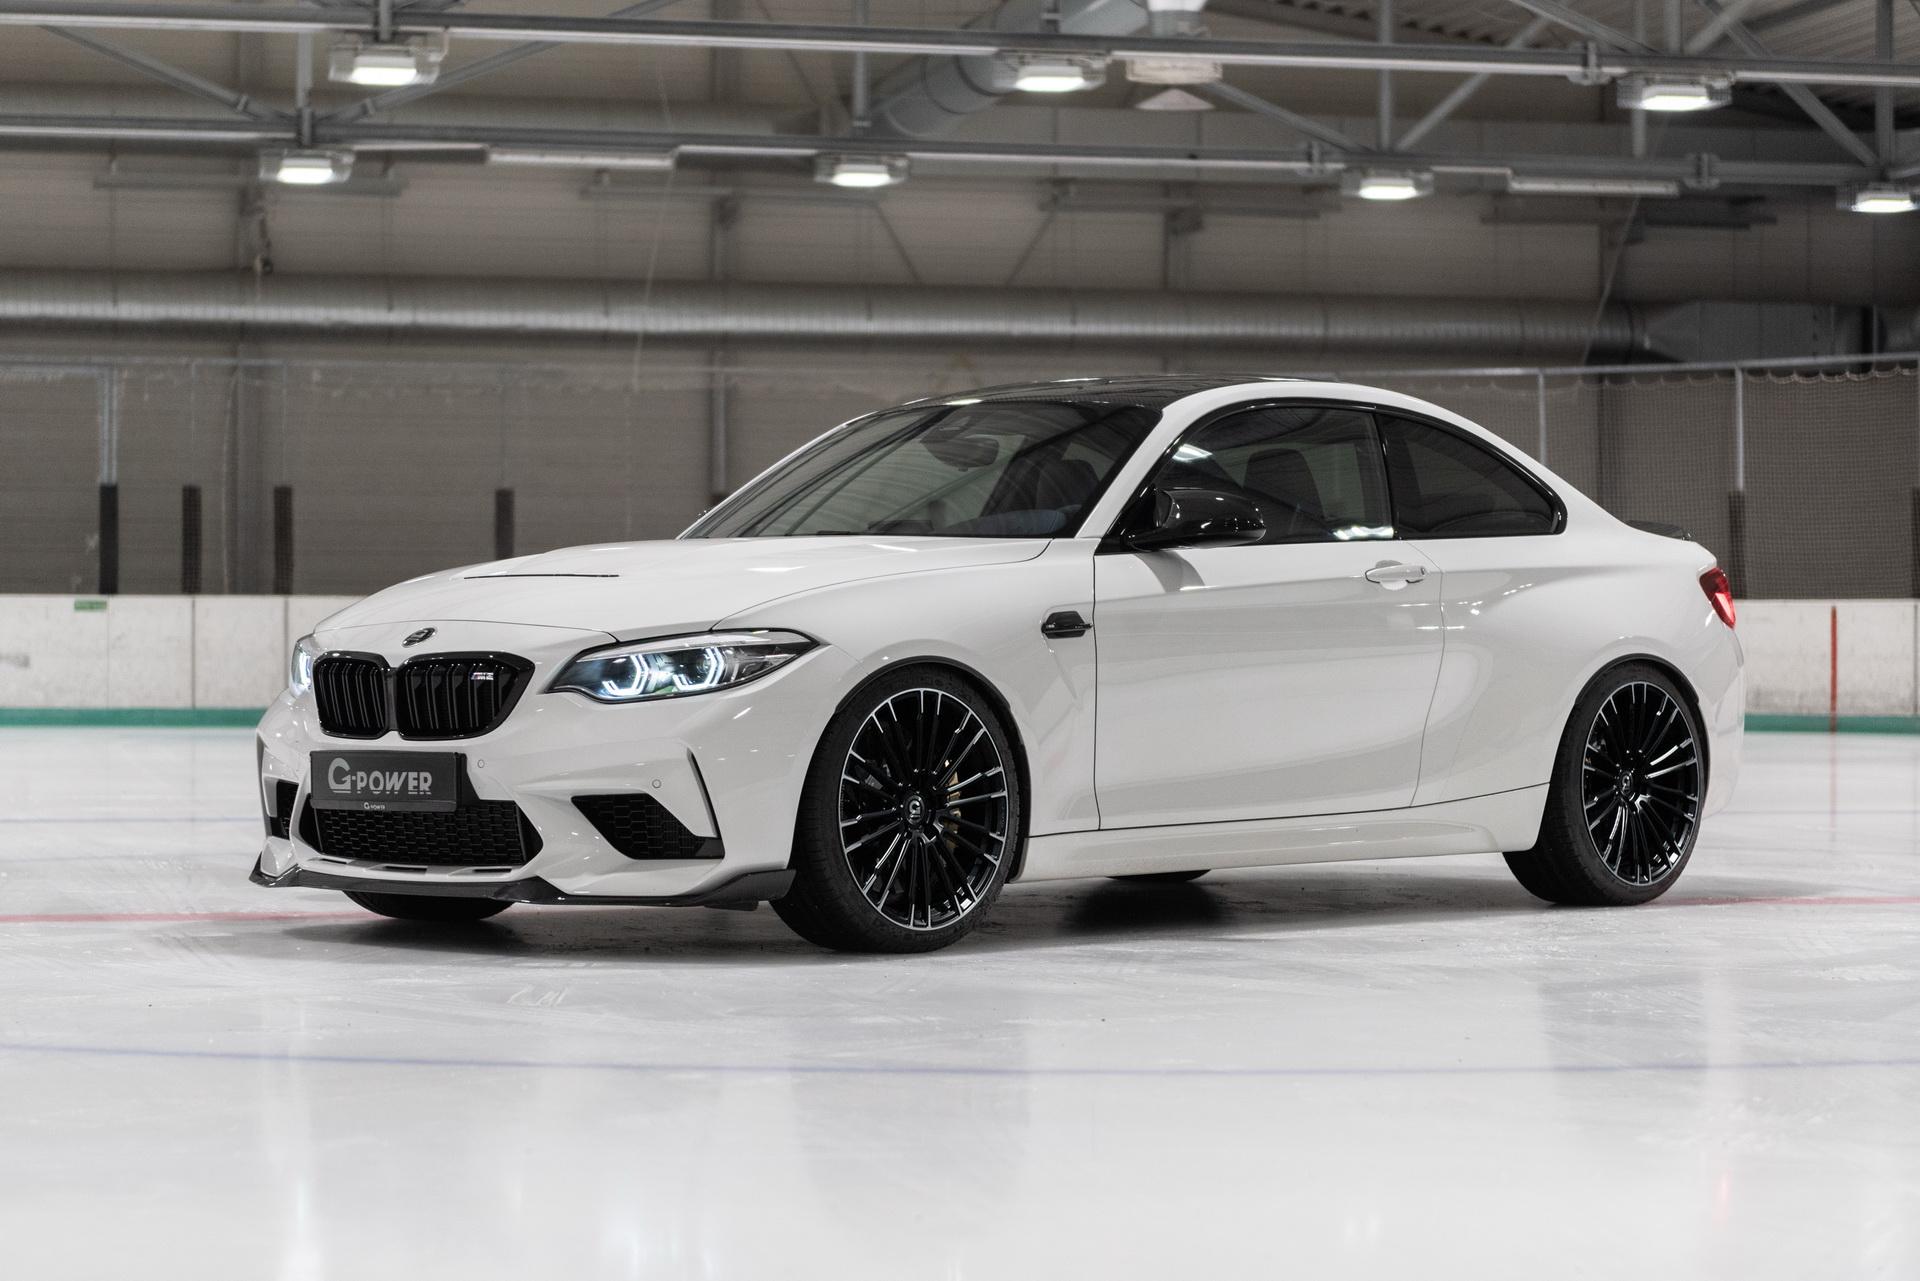 BMW-M2-CS-by-G-Power-15